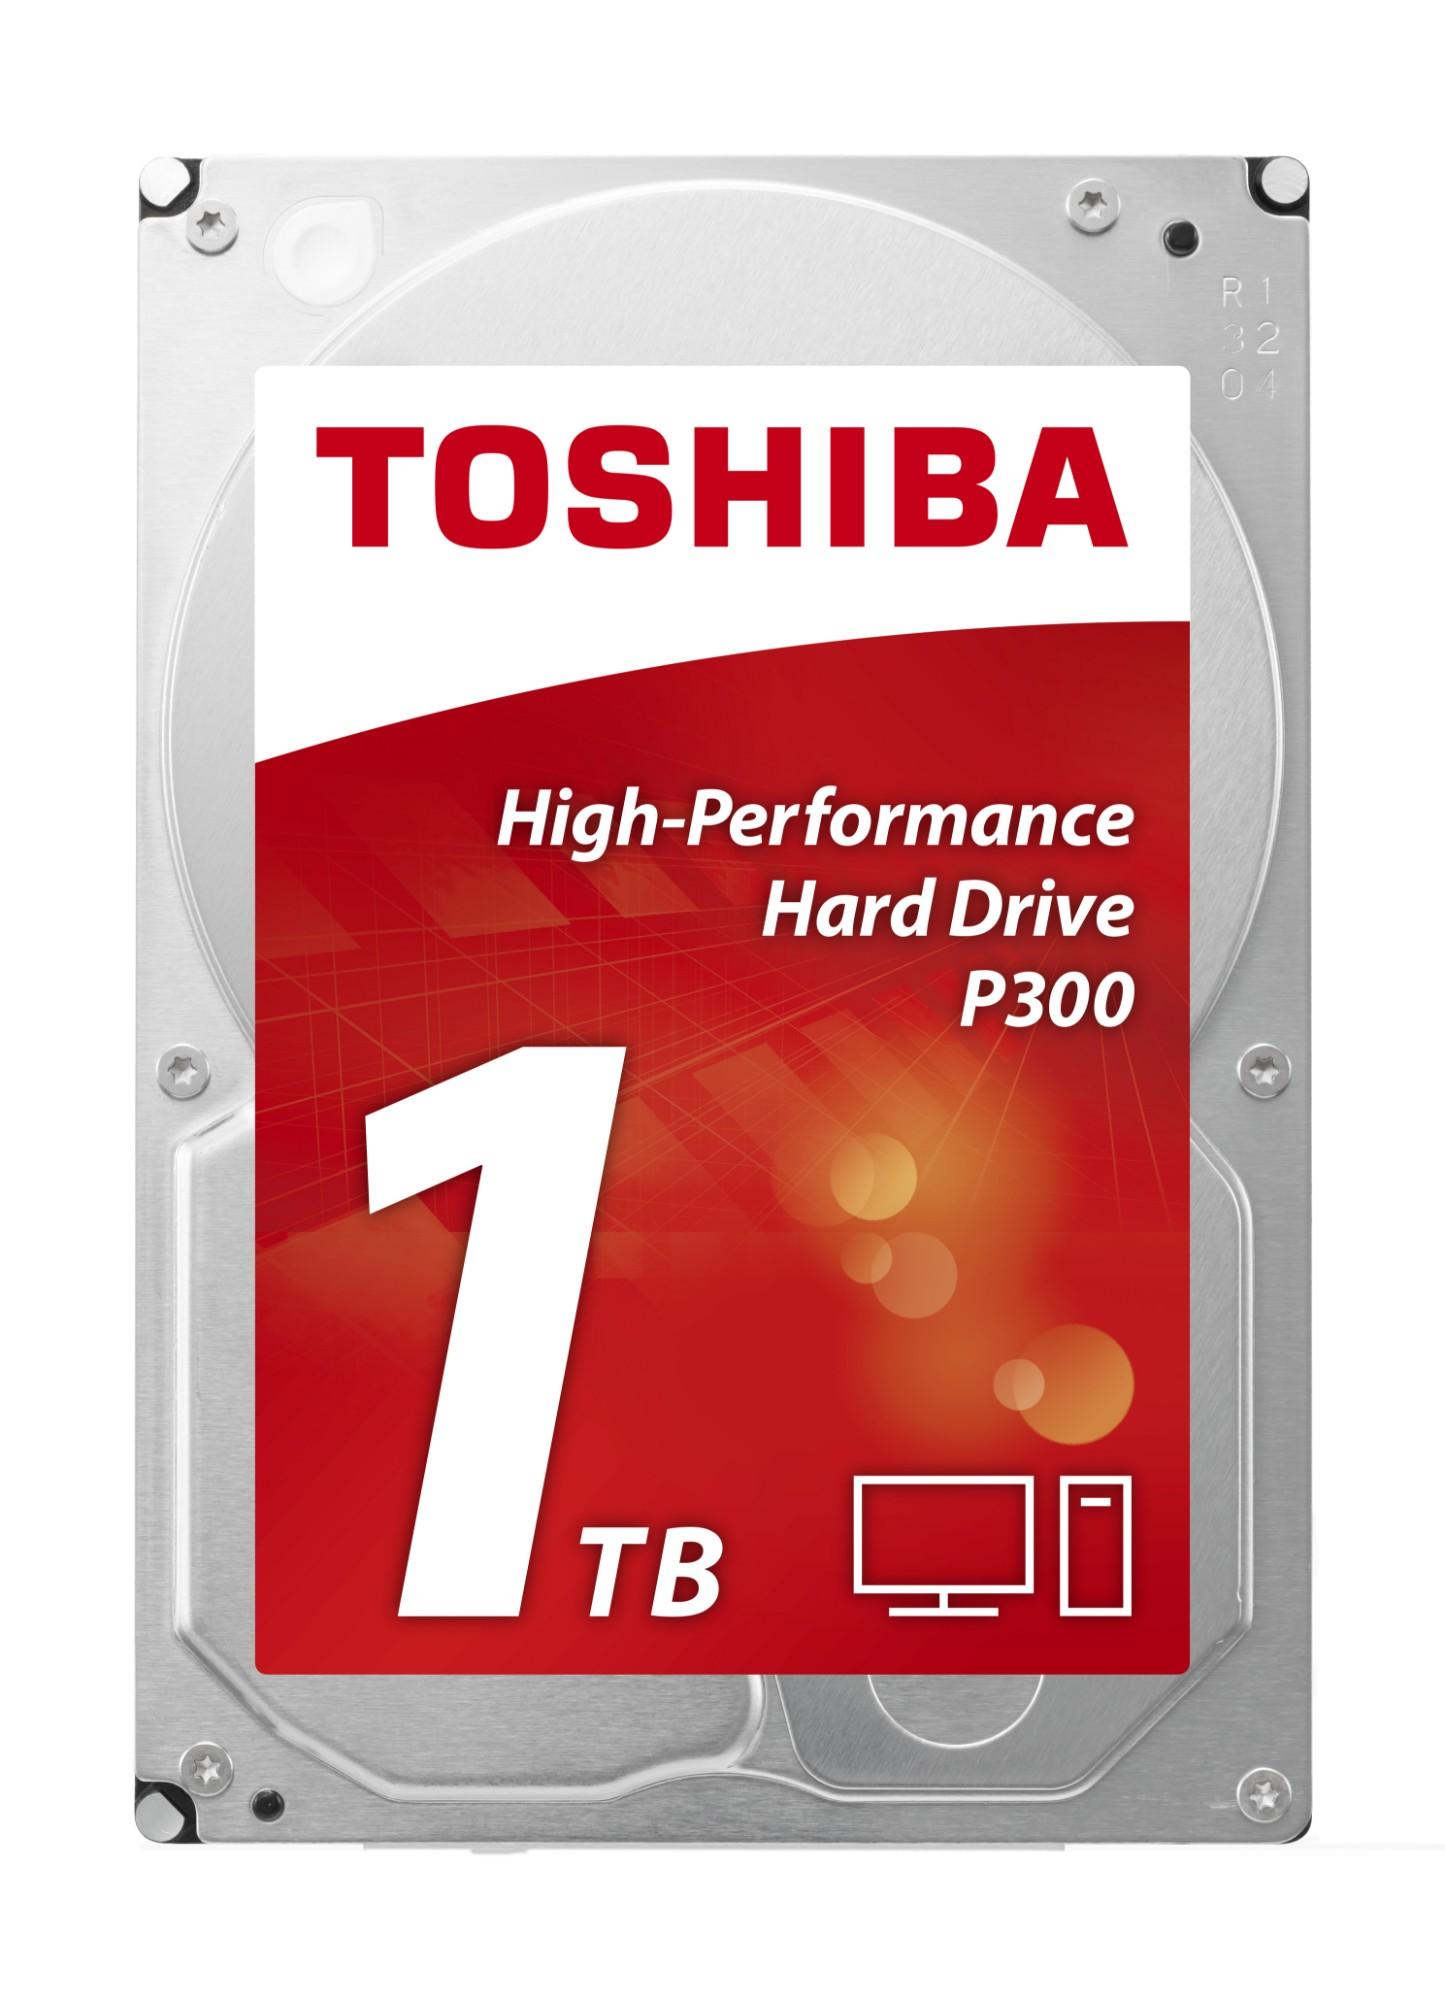 Hard Drive 1TB P300 - High-performance